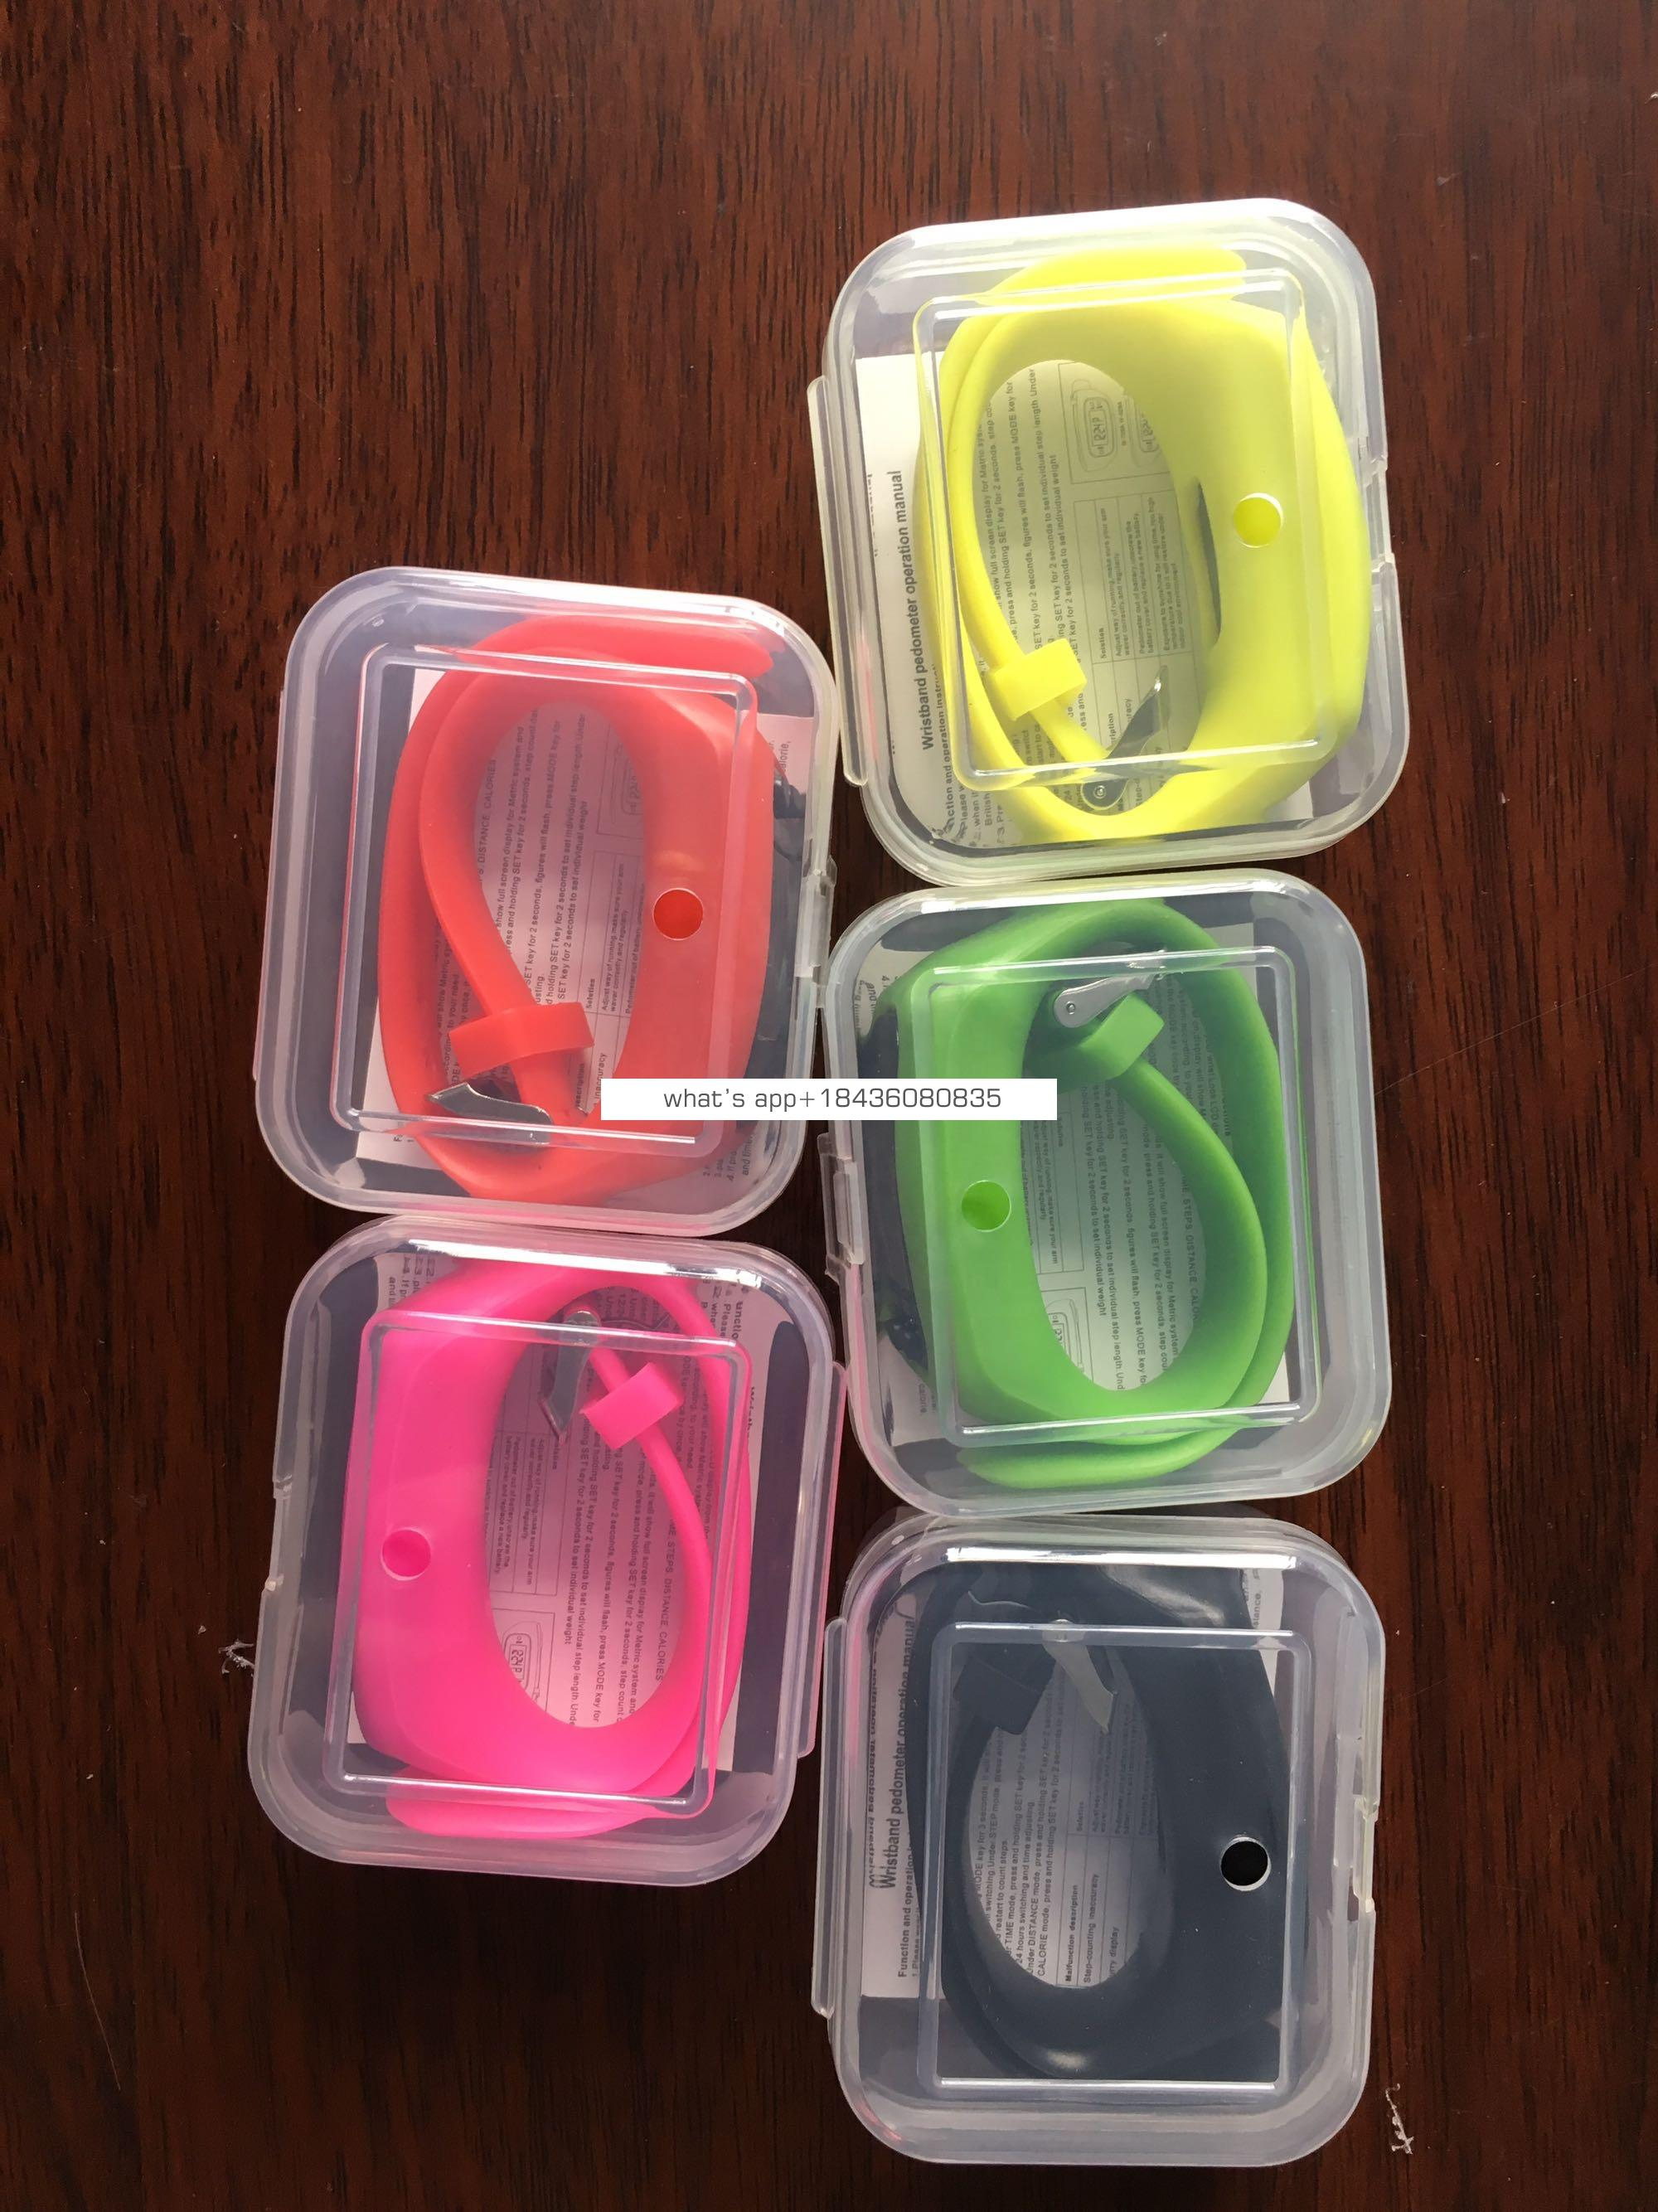 China Manufacturer CE Rohs Step Calorie Count Smart Watch Band Smart Bracelet Fitness Tracker 2D 3D Pedometer